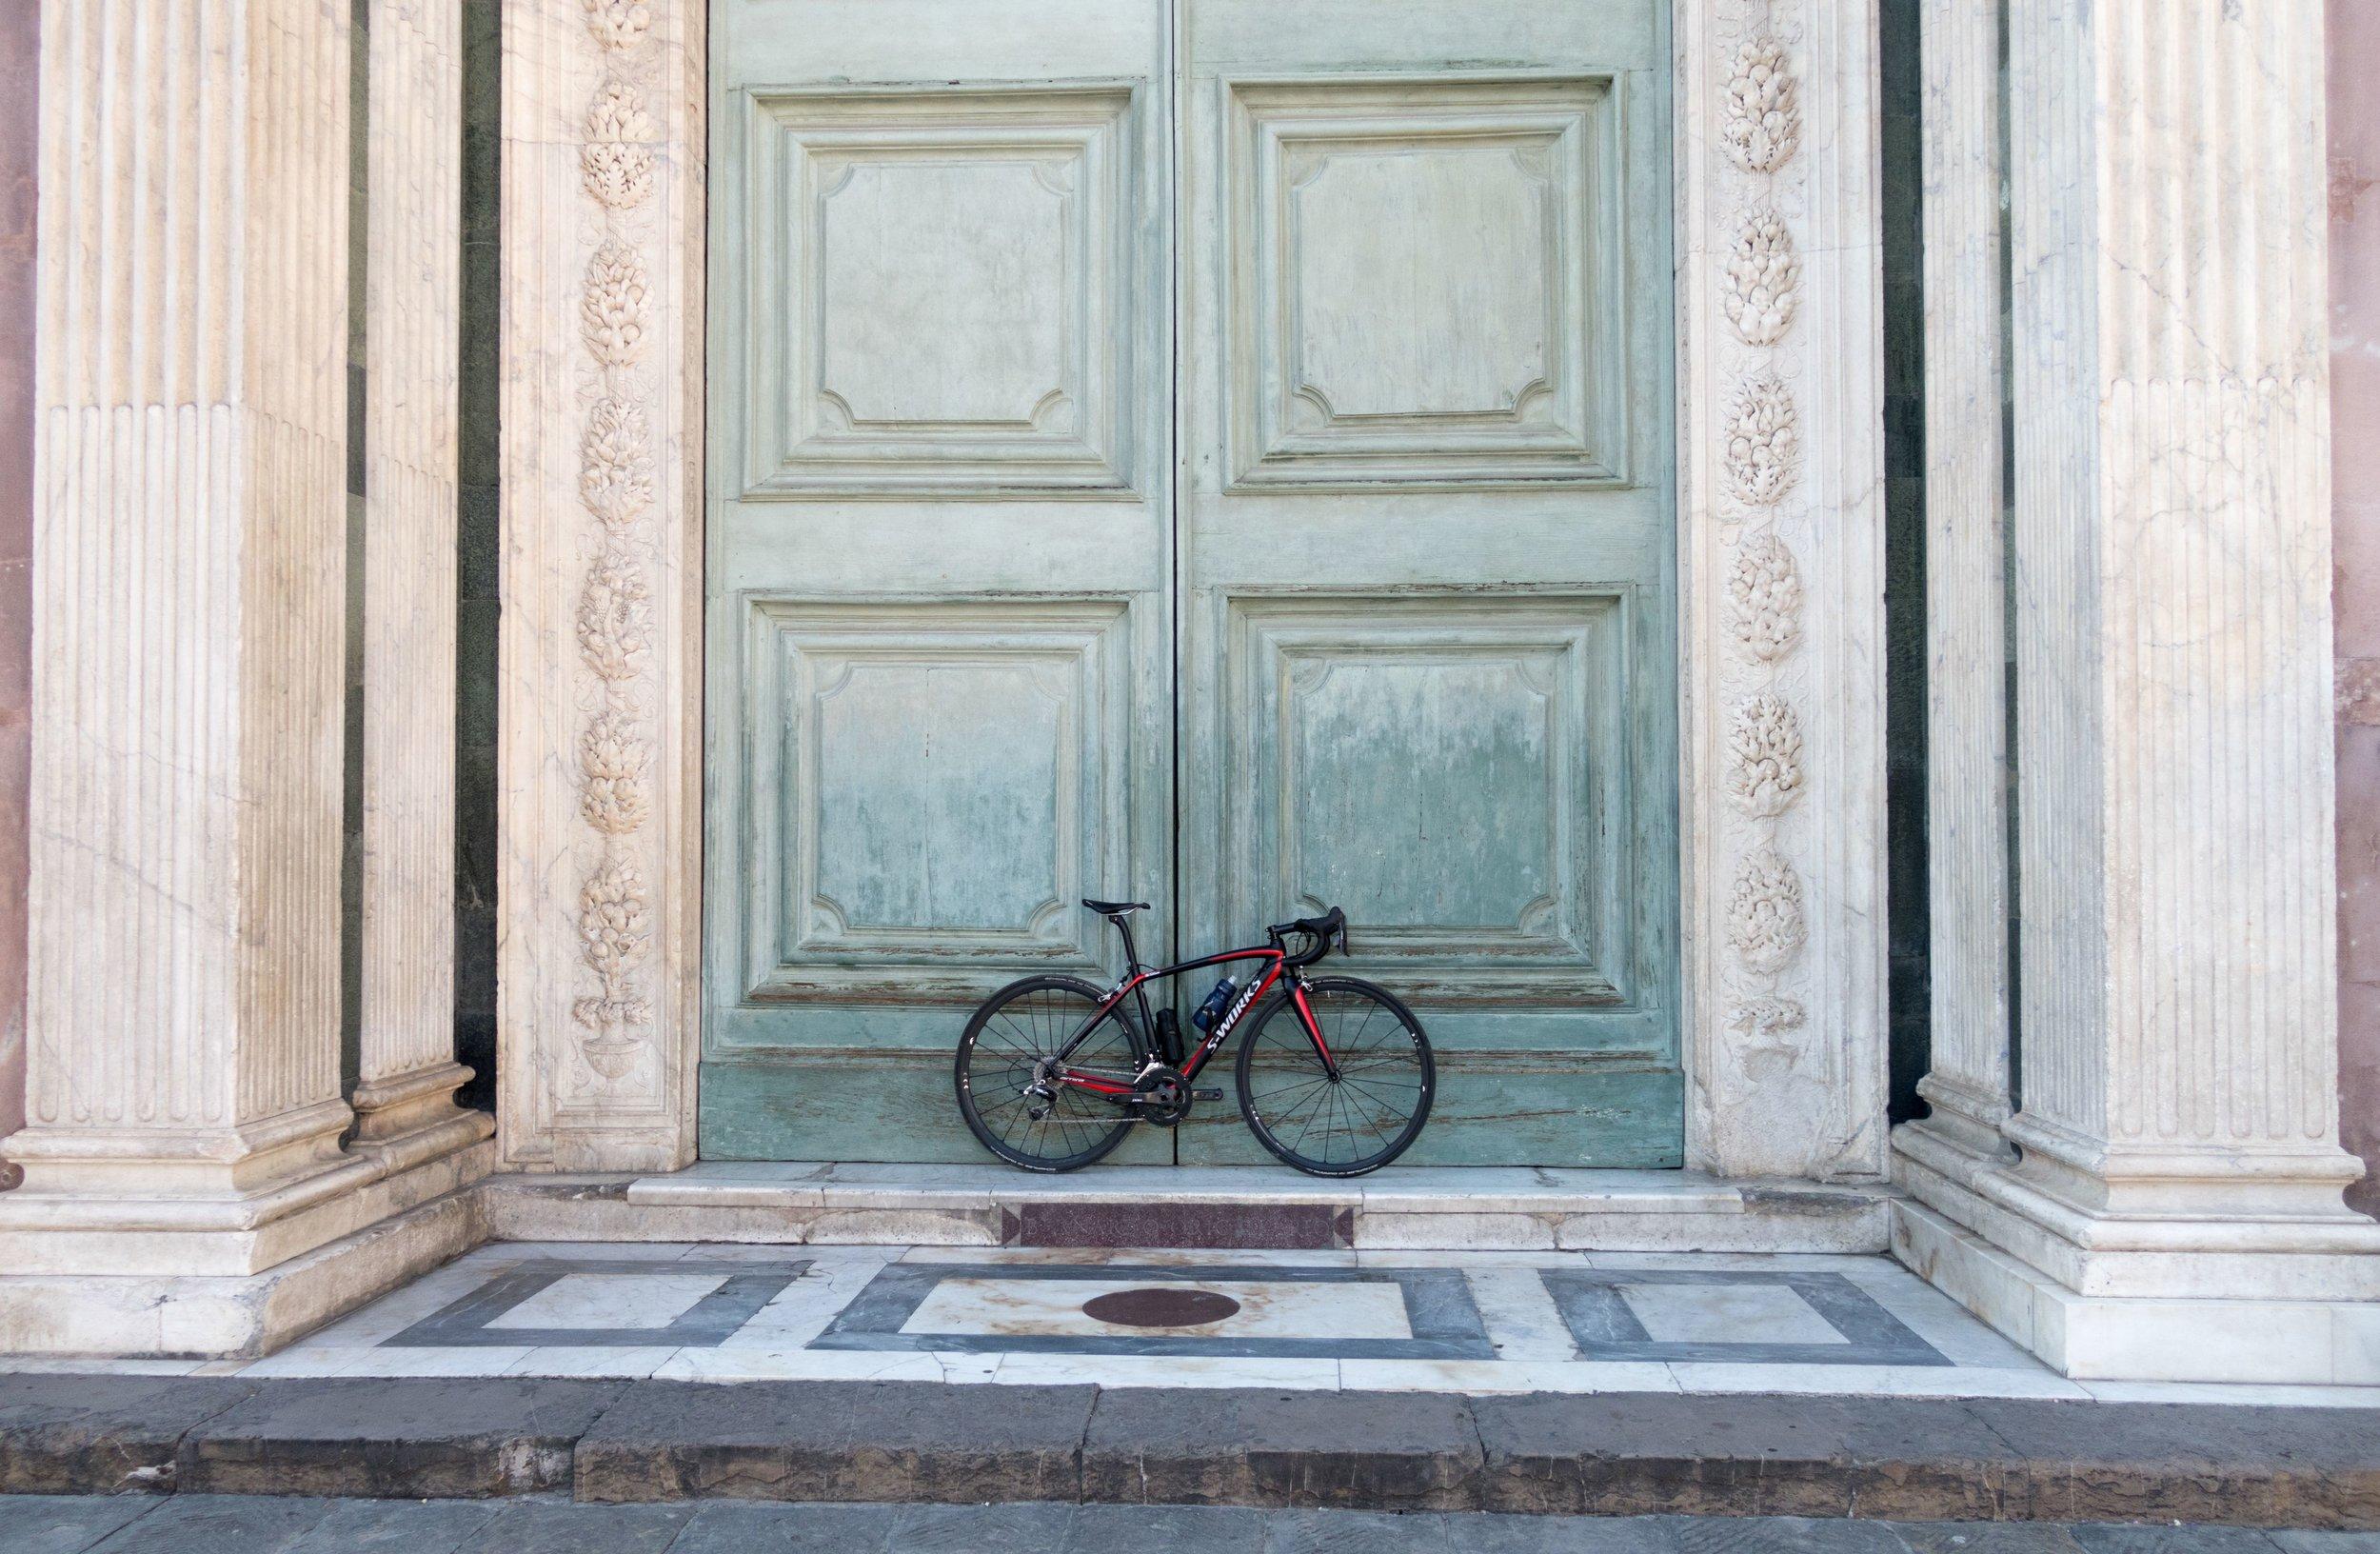 La Basilica di Santa Maria Novella, Florence. Photograph: Alison Testroete